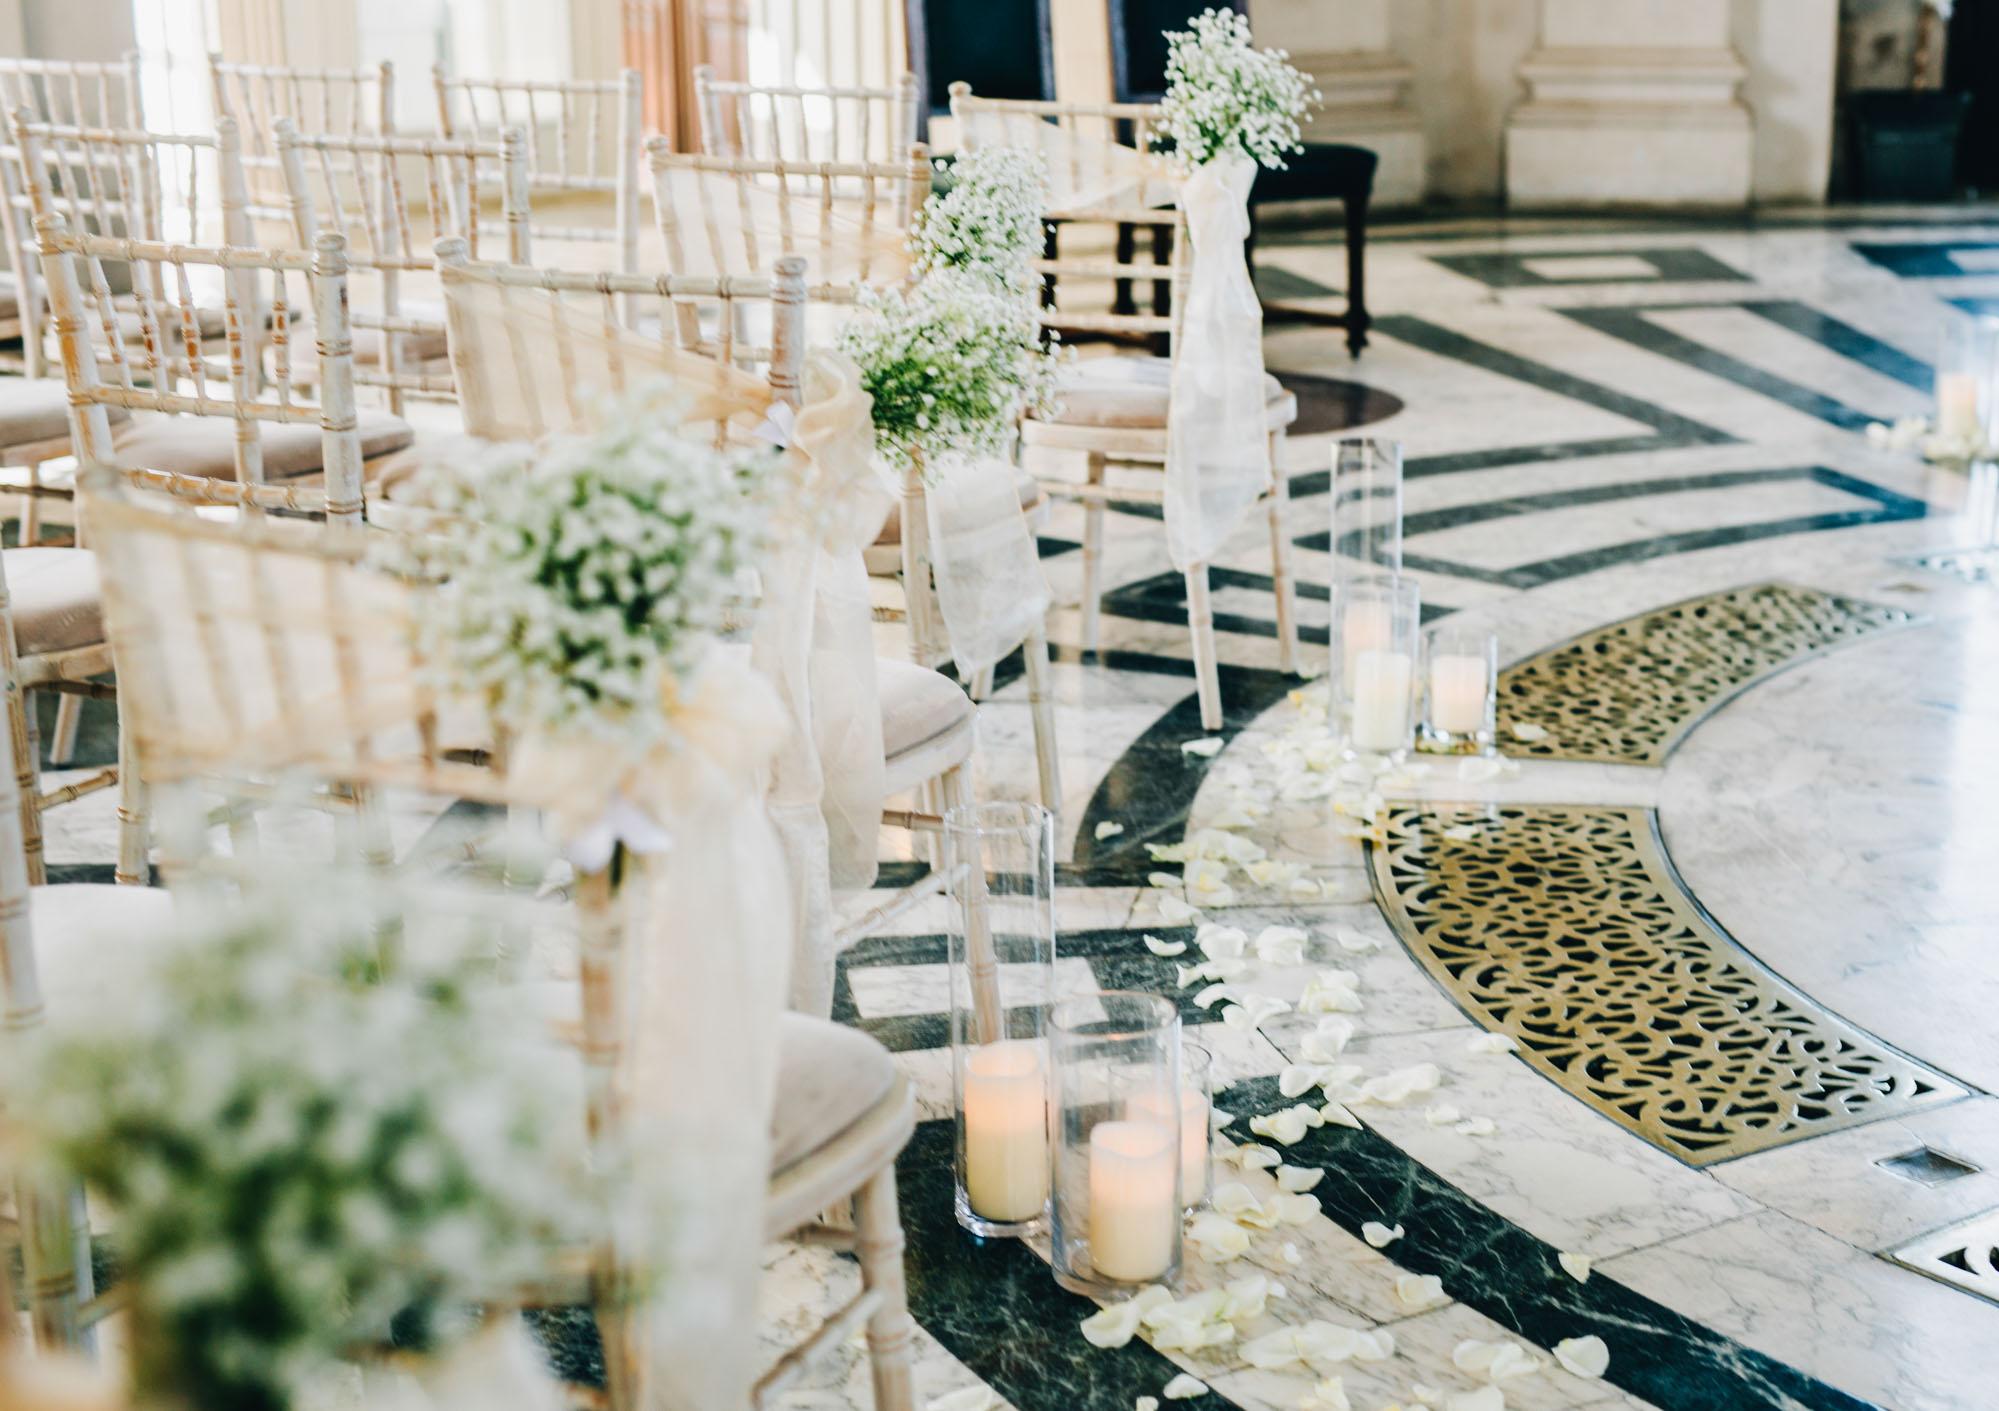 interior of the Ashton Memorial wedding venue